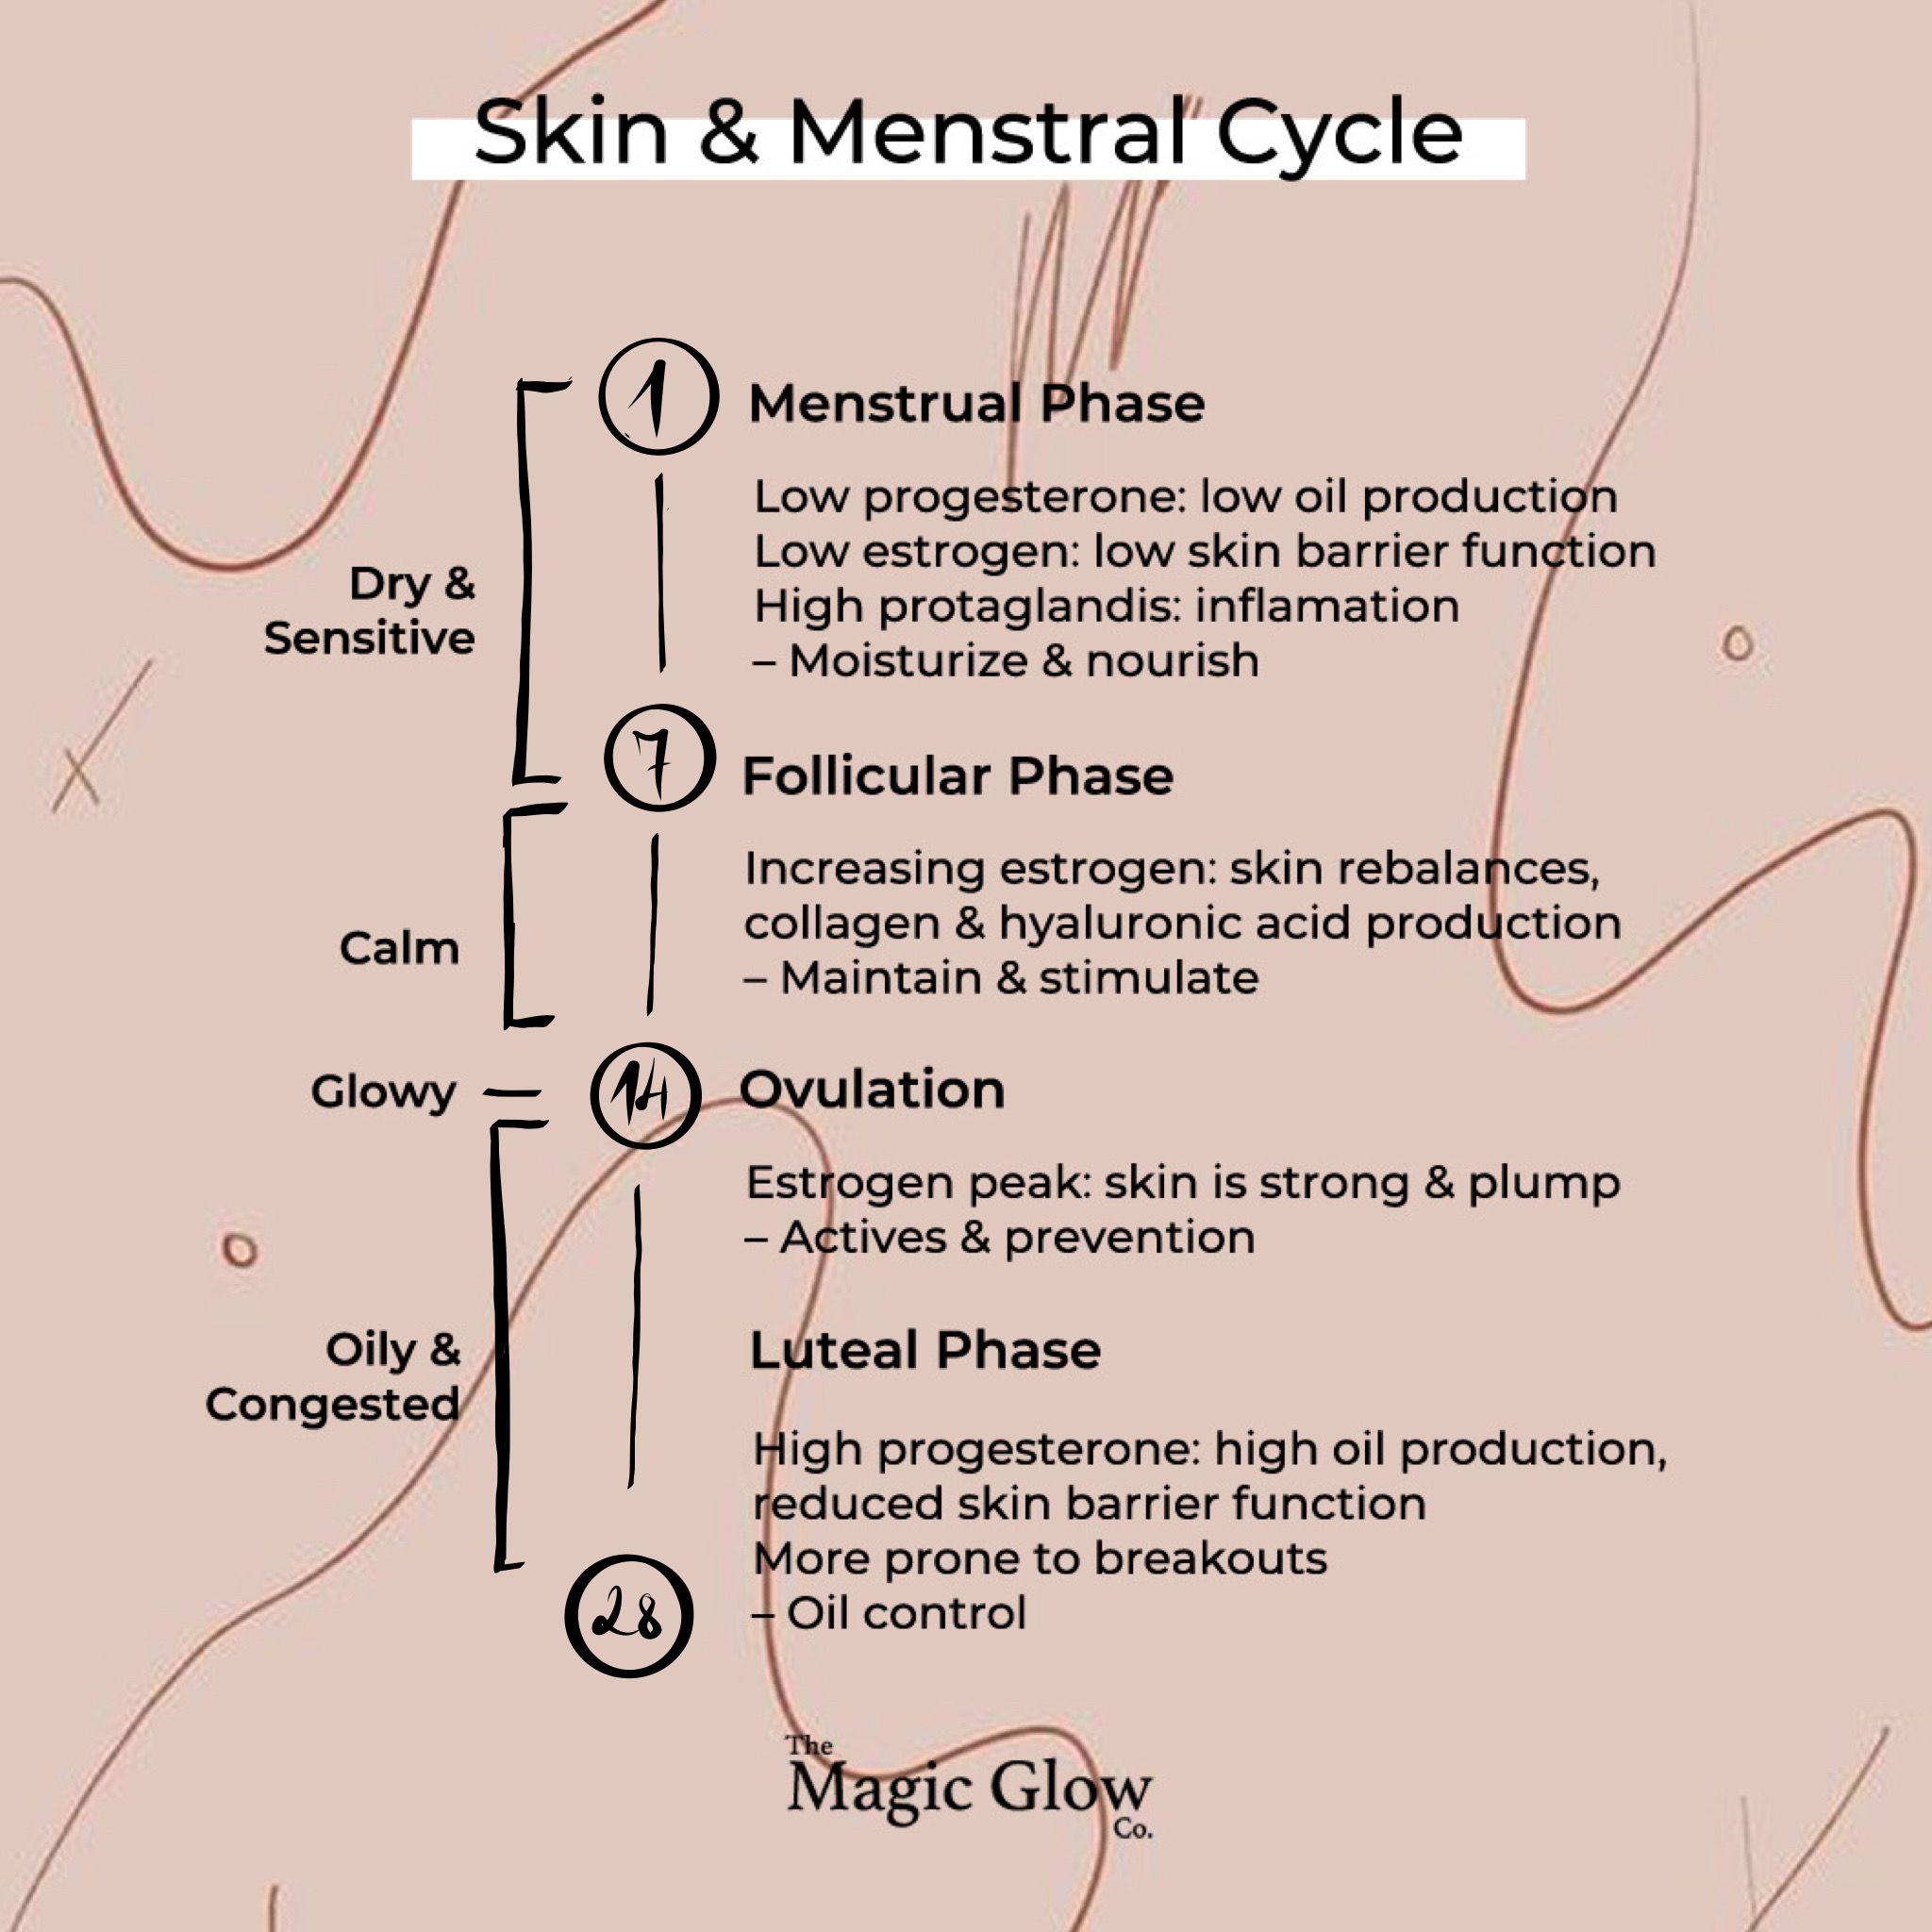 The Magic Glow Co. Online Kbeauty & Korean Skin Care